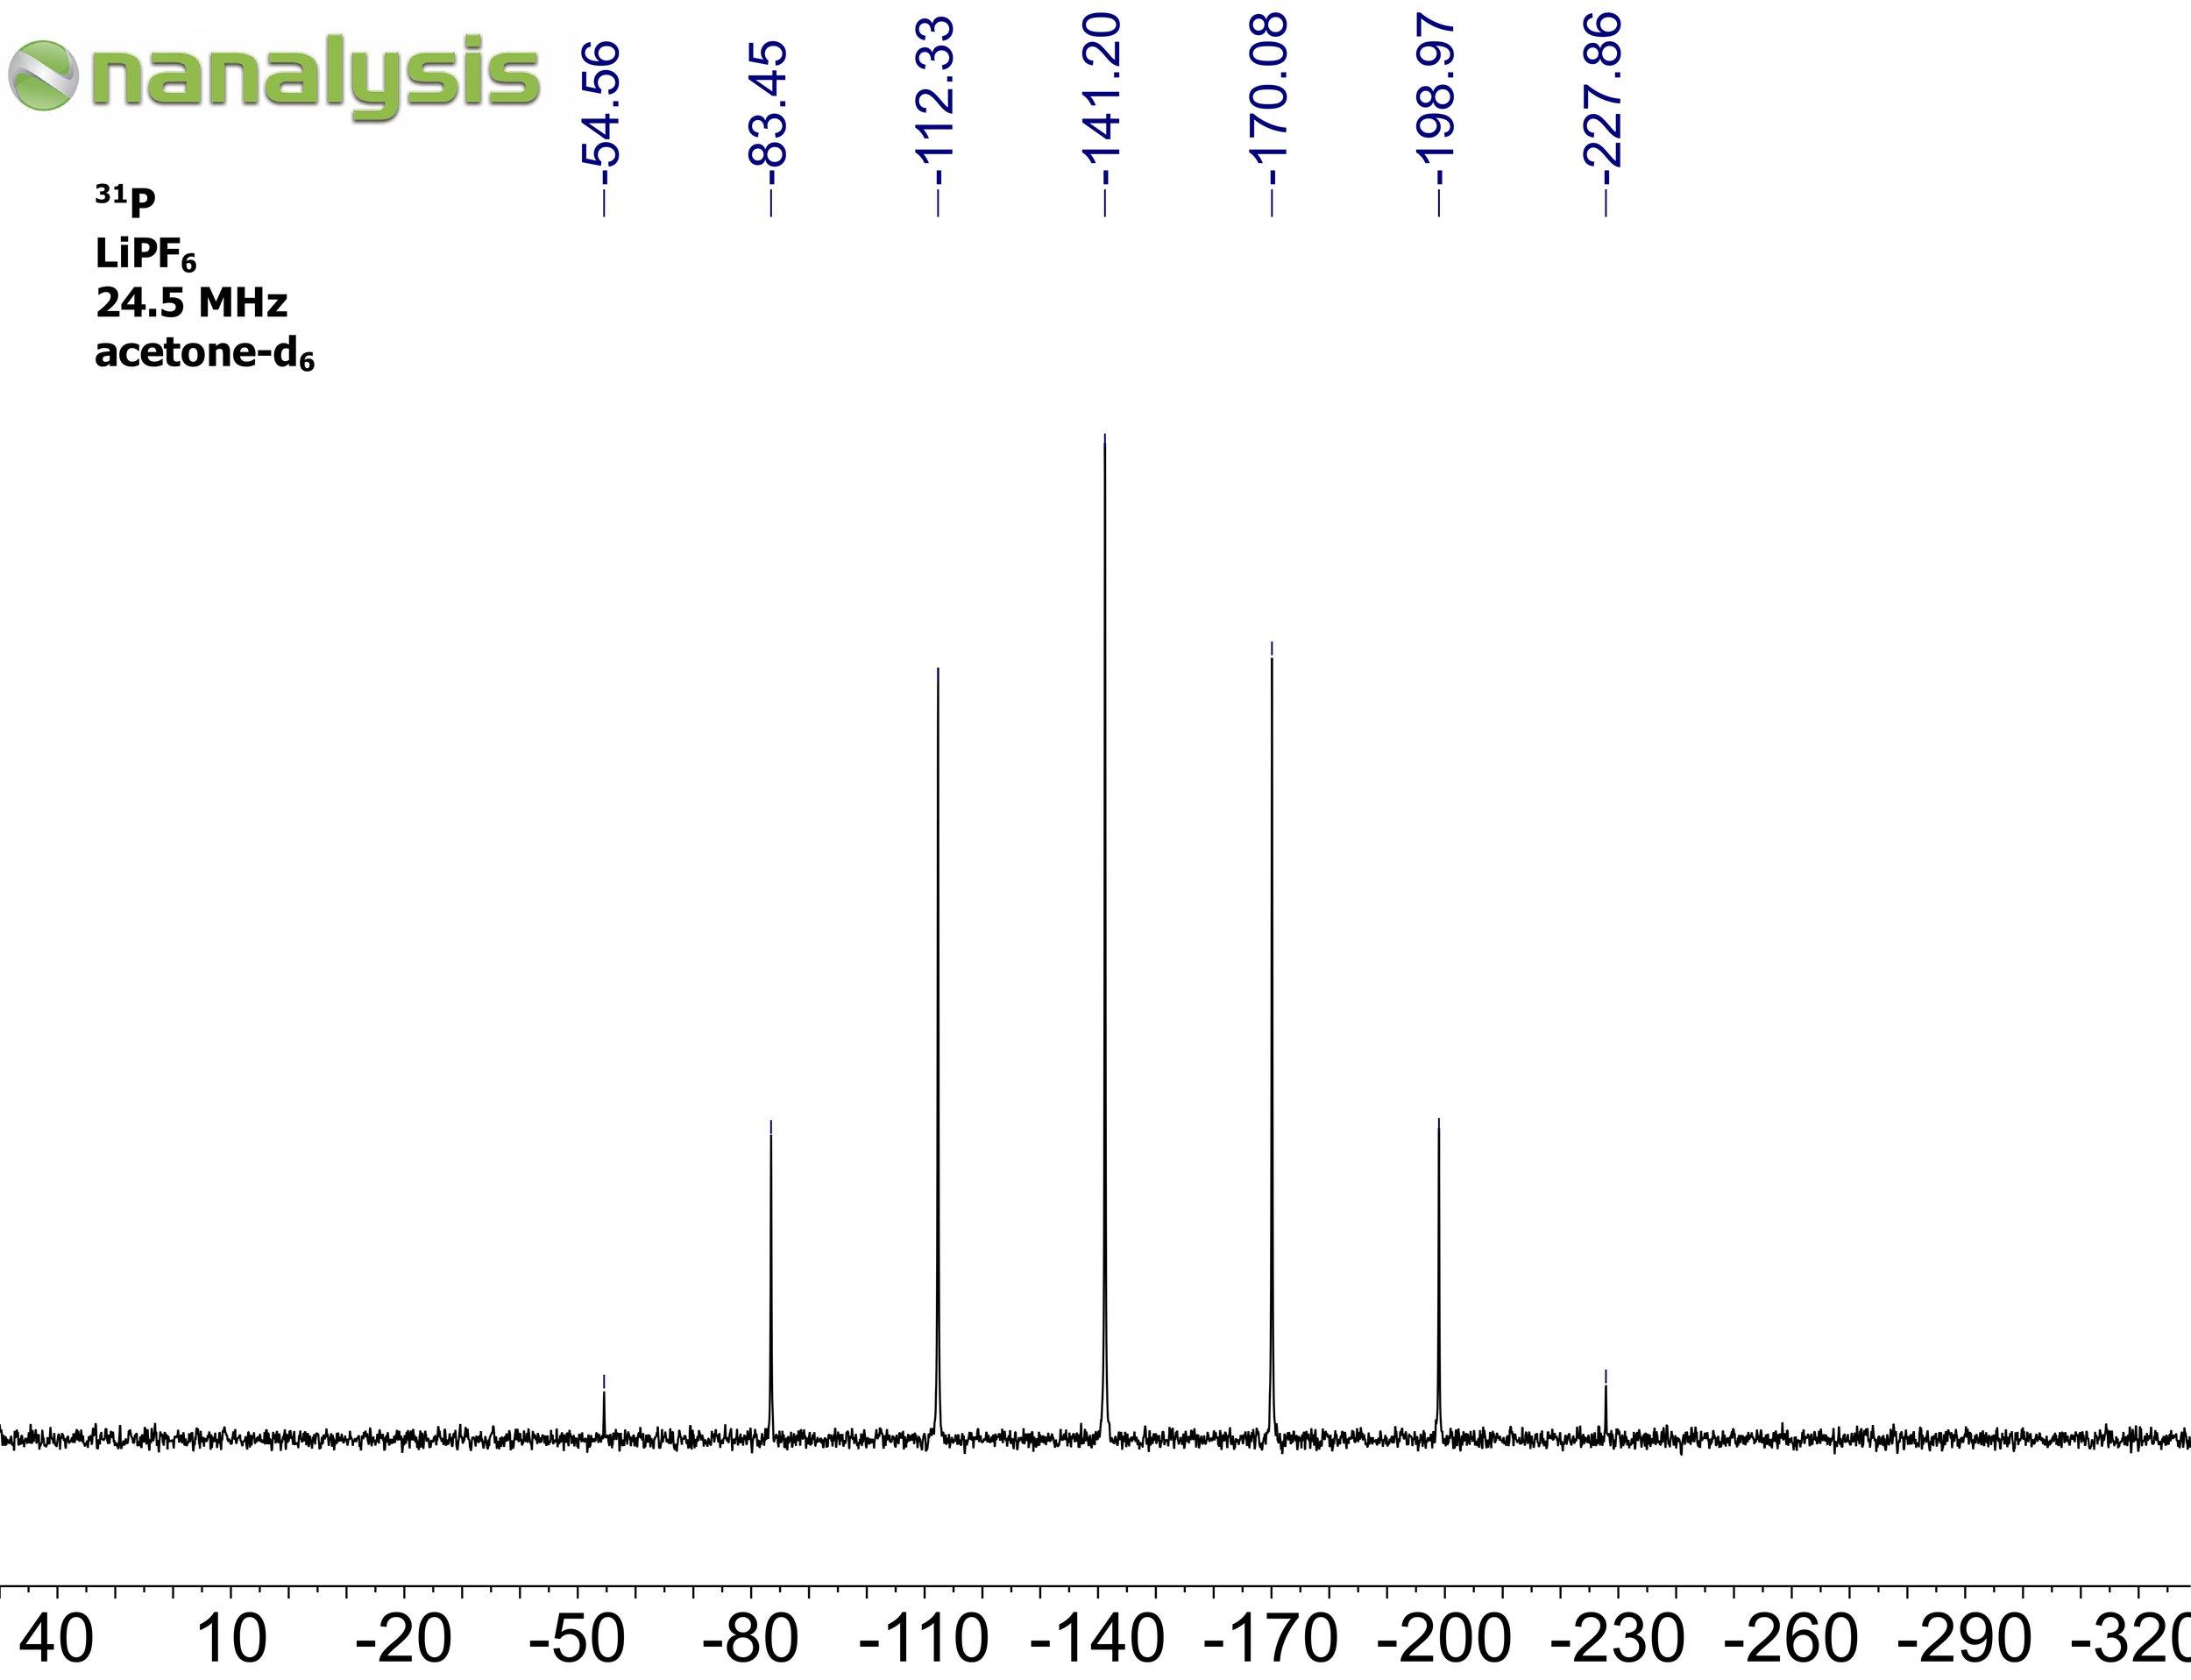 Figure 2.  31P NMR spectrum of lithium hexafluorophosphate in acetone-d6.